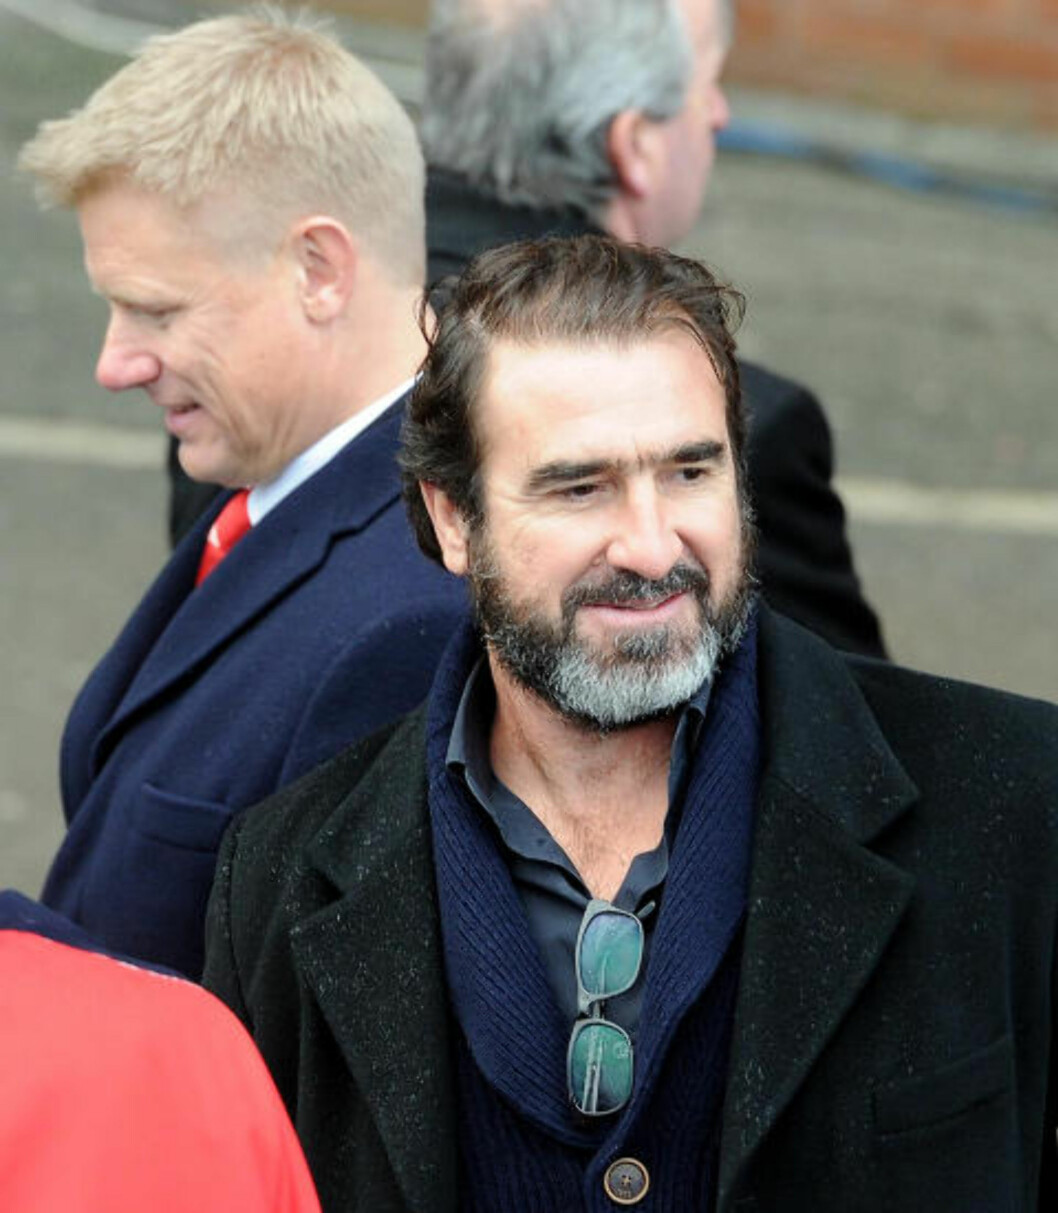 <strong>GAMLE HELTER:</strong> Eric Cantona og Peter Schmeichel var blant de tidligere United-spillerne som kastet glans over dagens avduking. Foto: MARTIN RICKETT / AP / PA / NTB SCANPIX